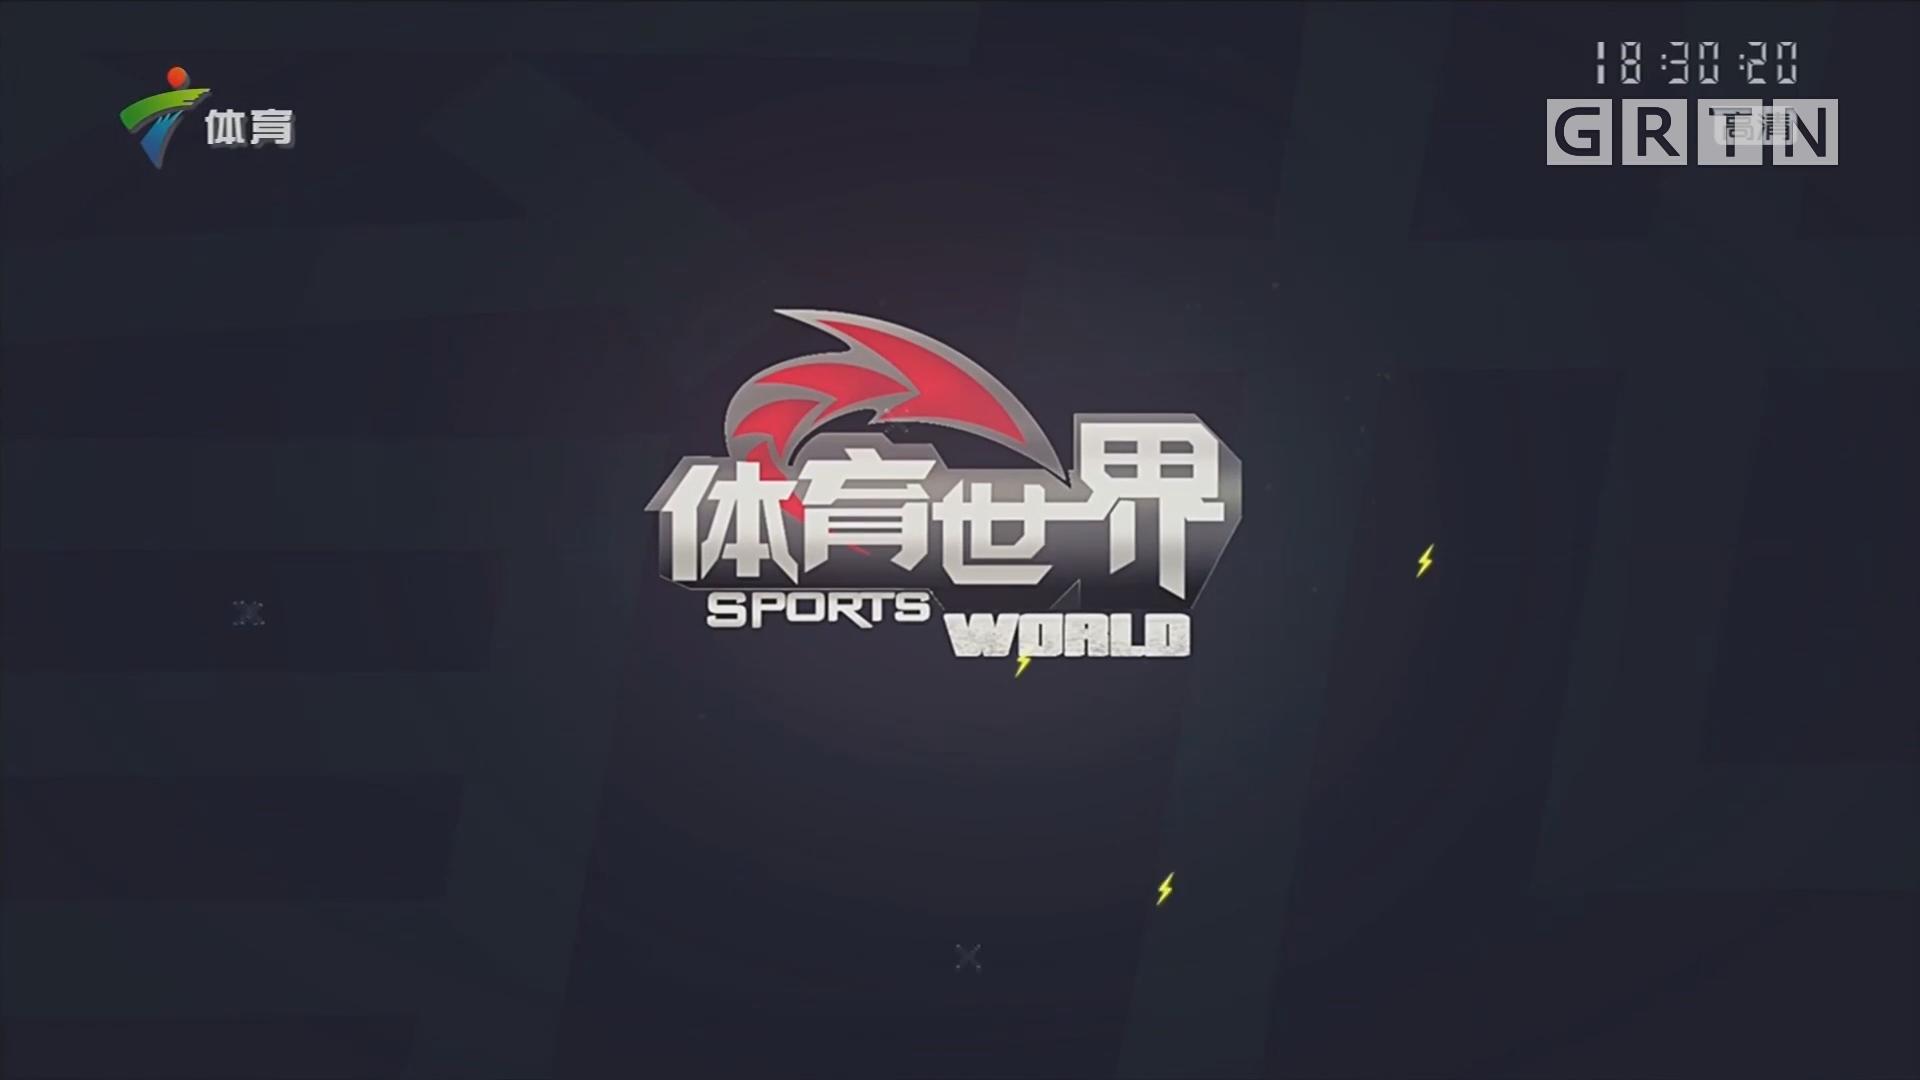 [HD][2018-08-17]体育世界:广州队接力显强势 惠州小将闪耀中长跑项目